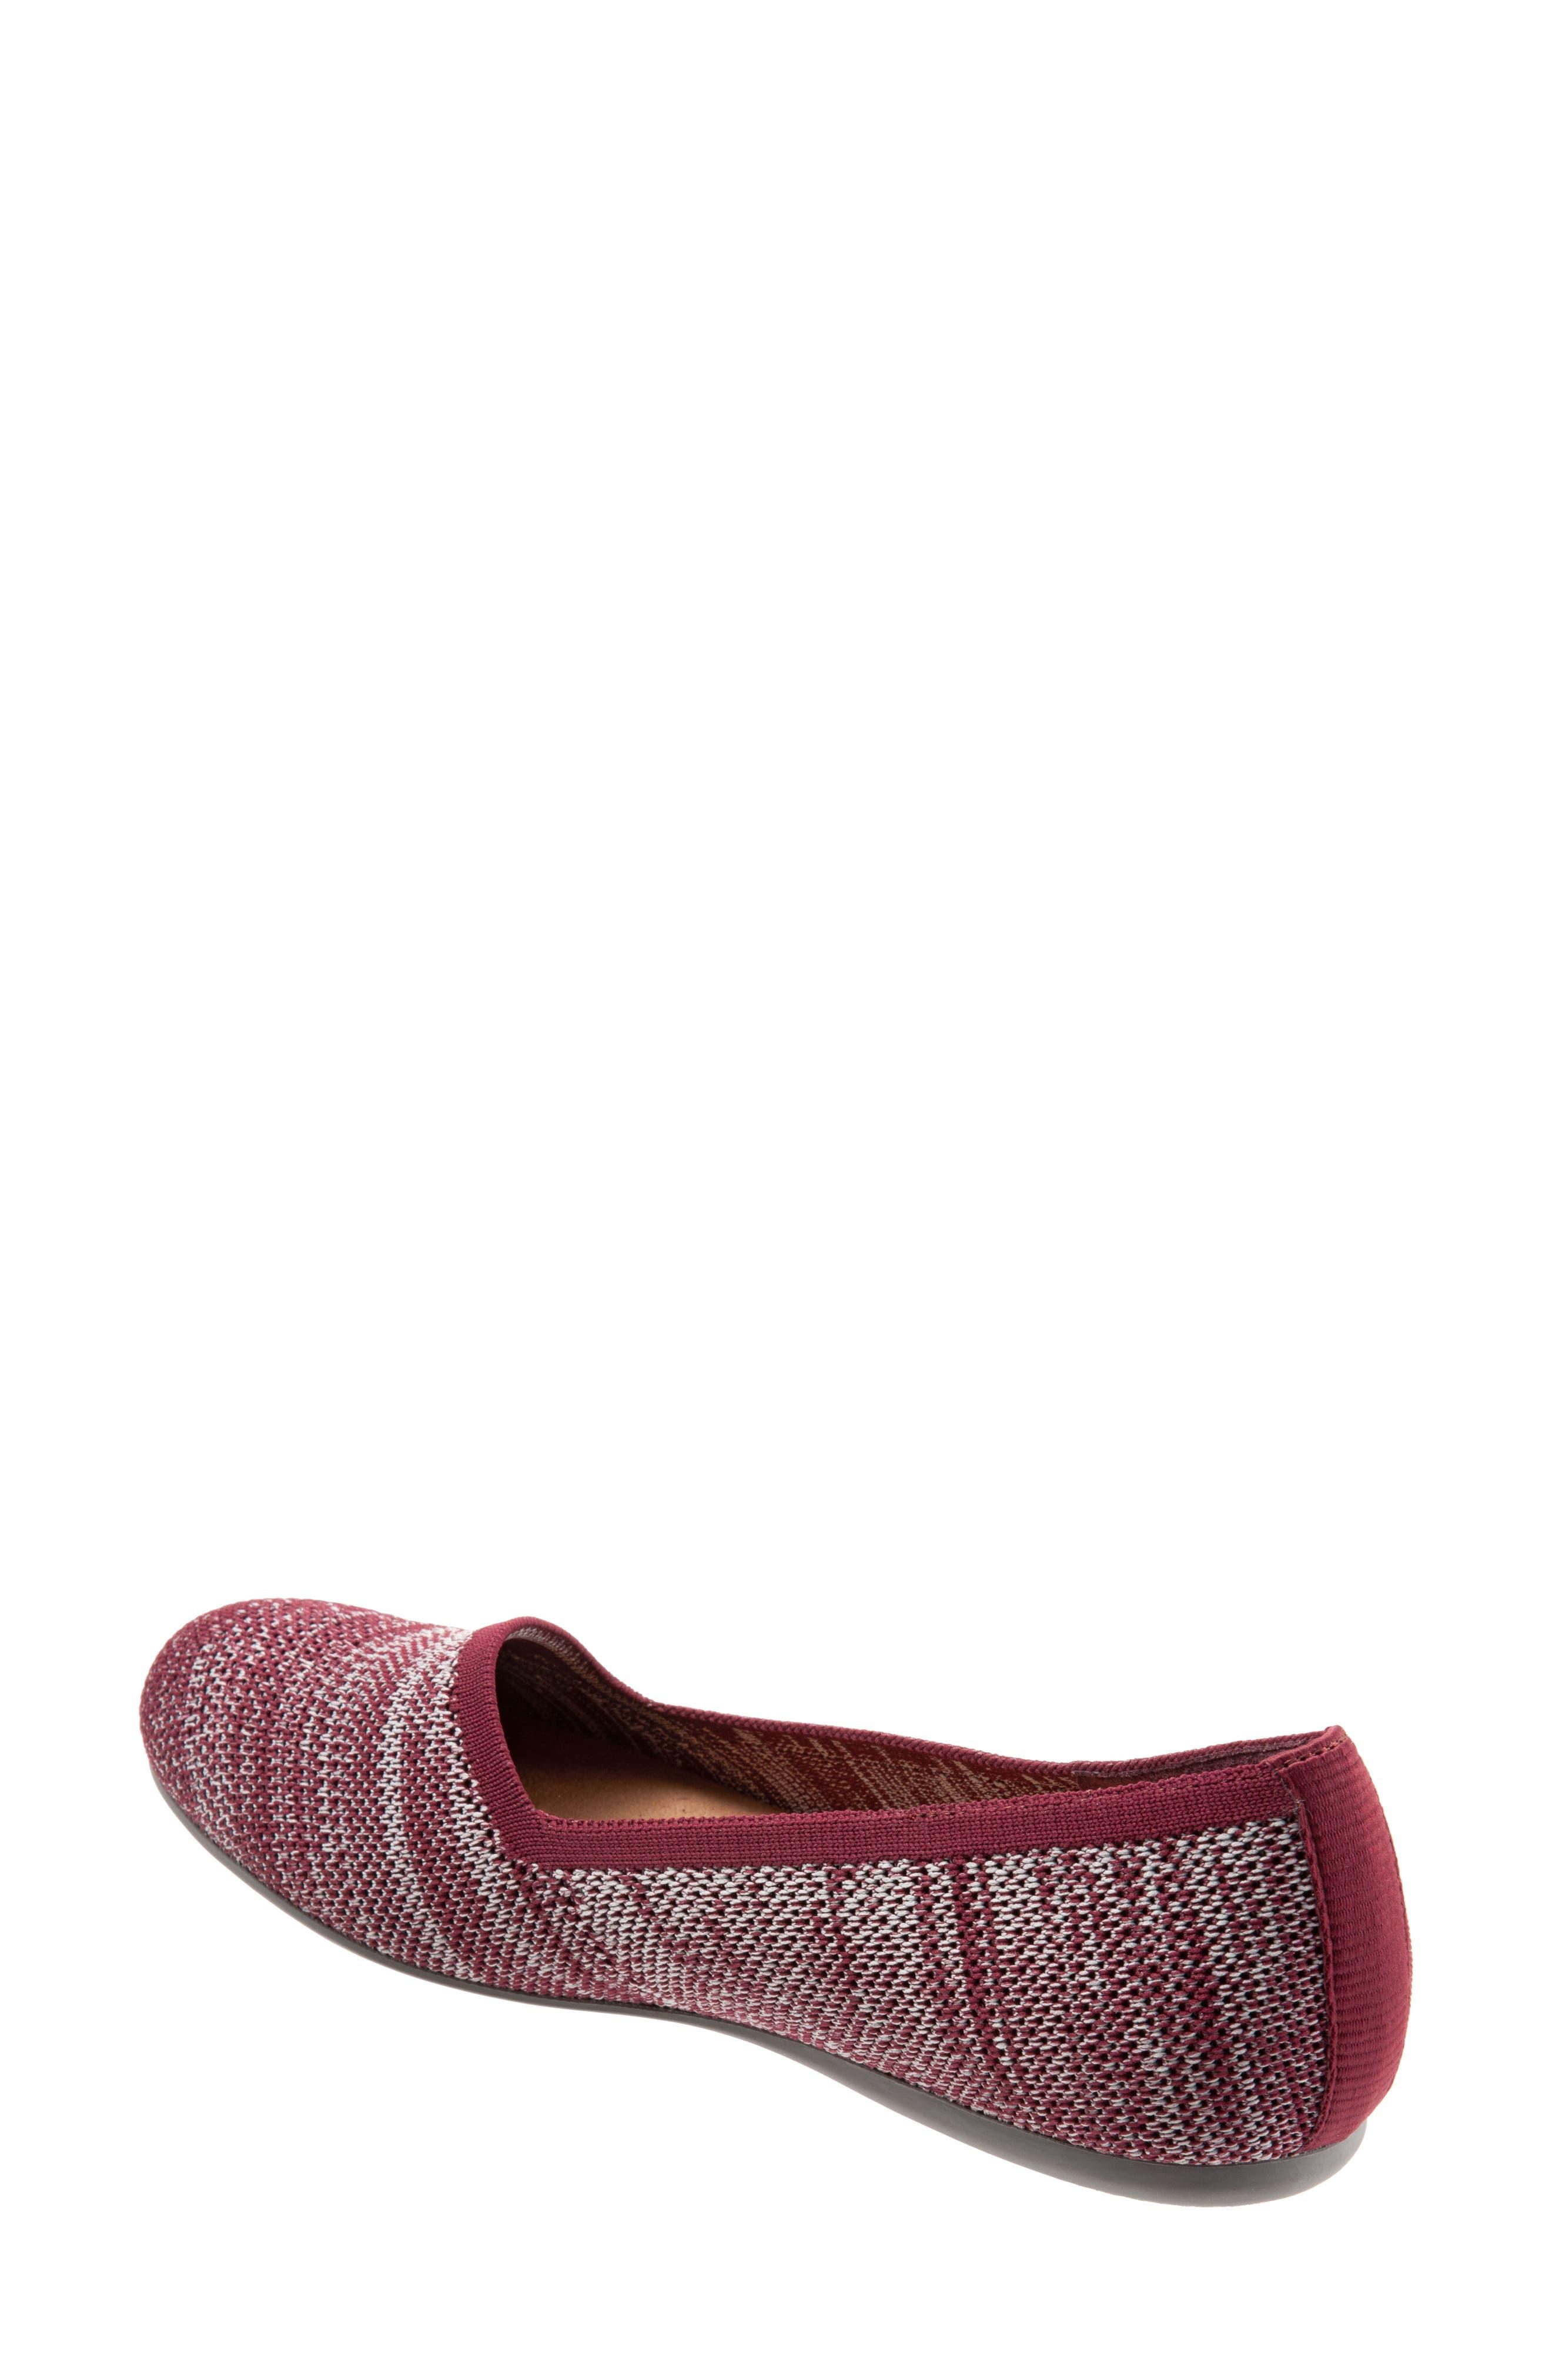 Sicily Knit Flat,                             Alternate thumbnail 2, color,                             BURGUNDY KNIT FABRIC